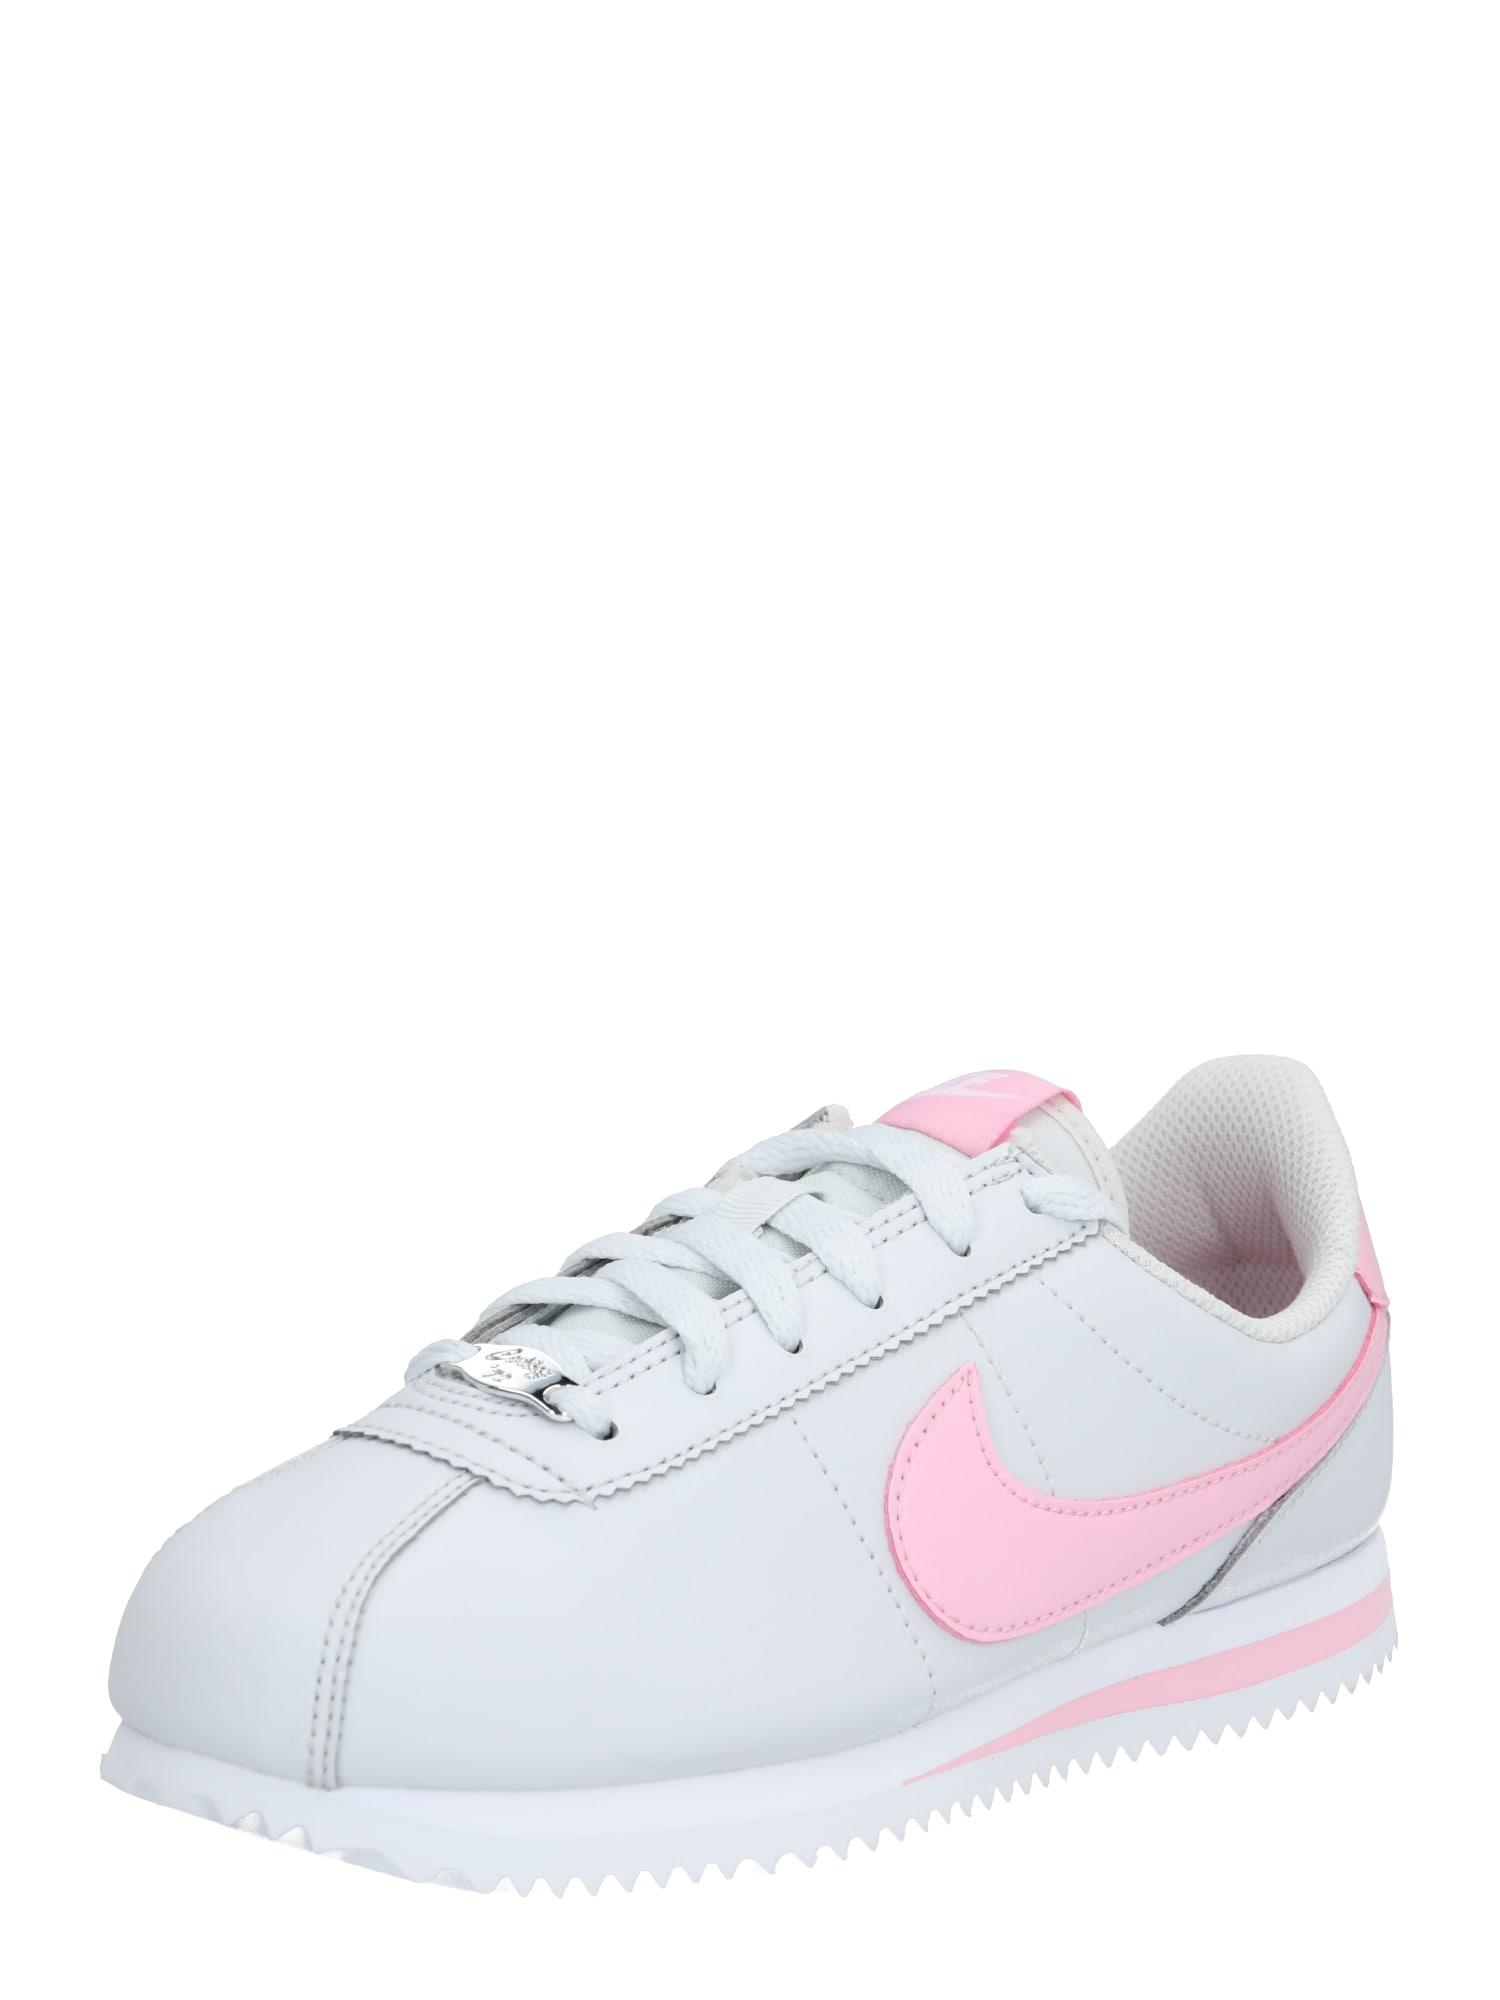 Nike Sportswear Tenisky 'Cortez'  strieborná / ružová / biela